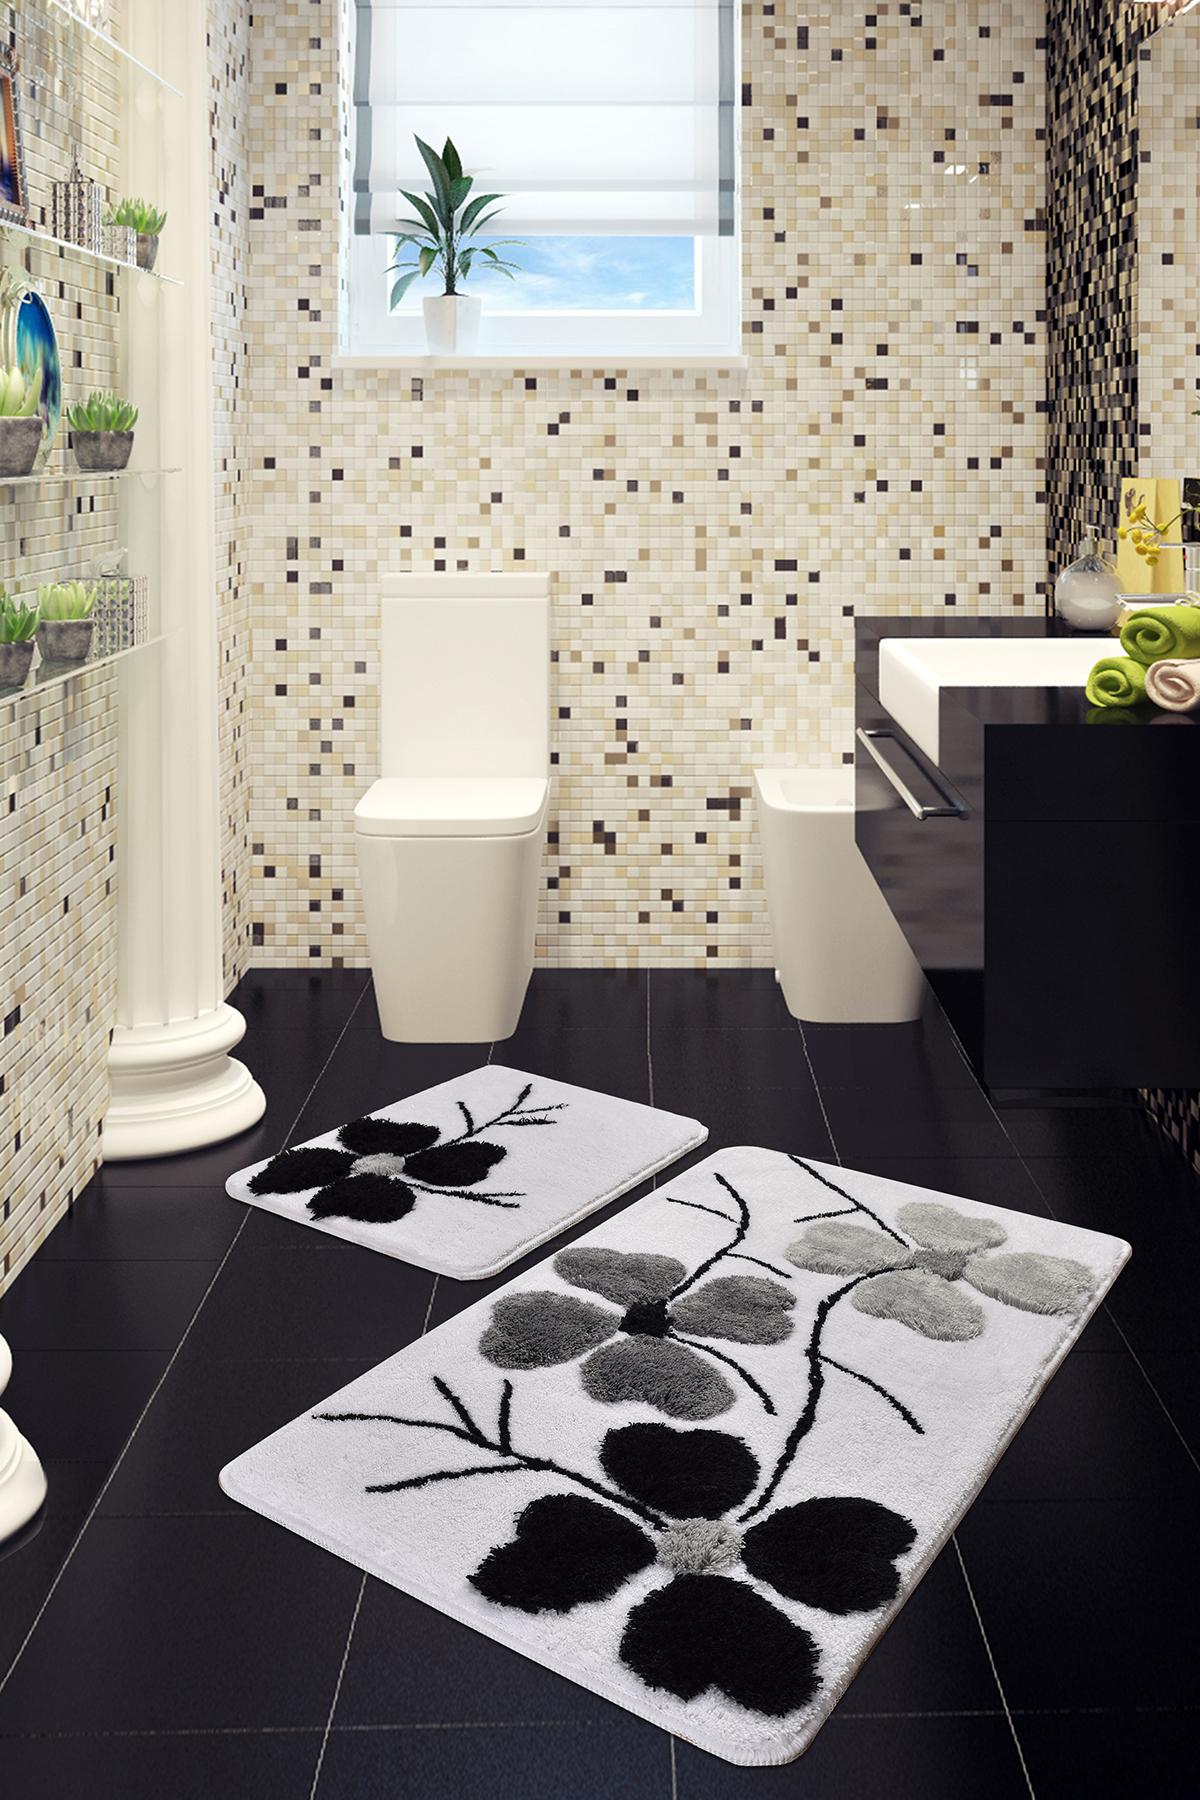 Коврик для ванной DO&CO (60Х100 см/50x60 см) KIRCICEGI